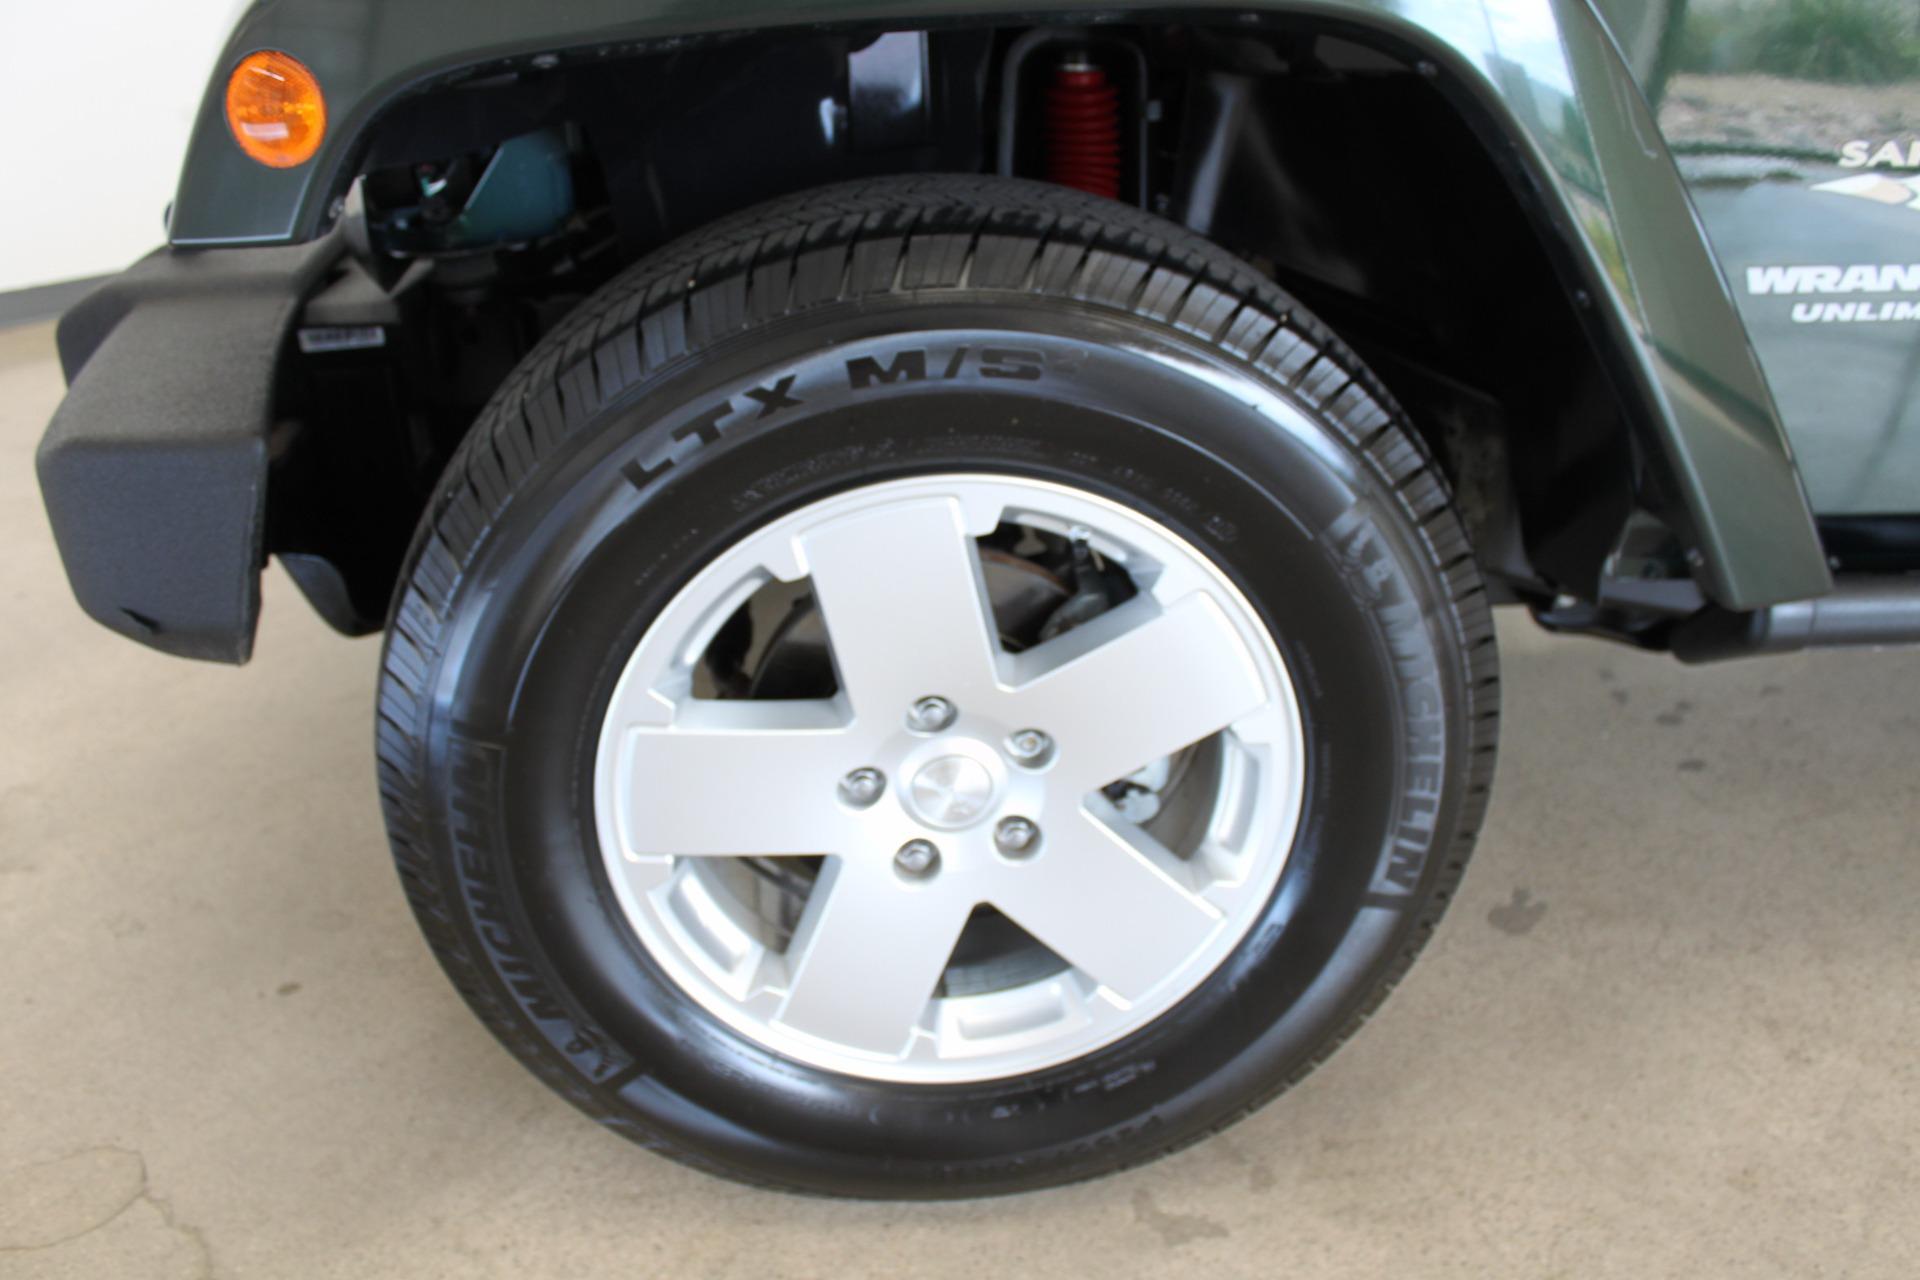 Used-2010-Jeep-Wrangler-Unlimited-Sahara-4X4-Land-Cruiser